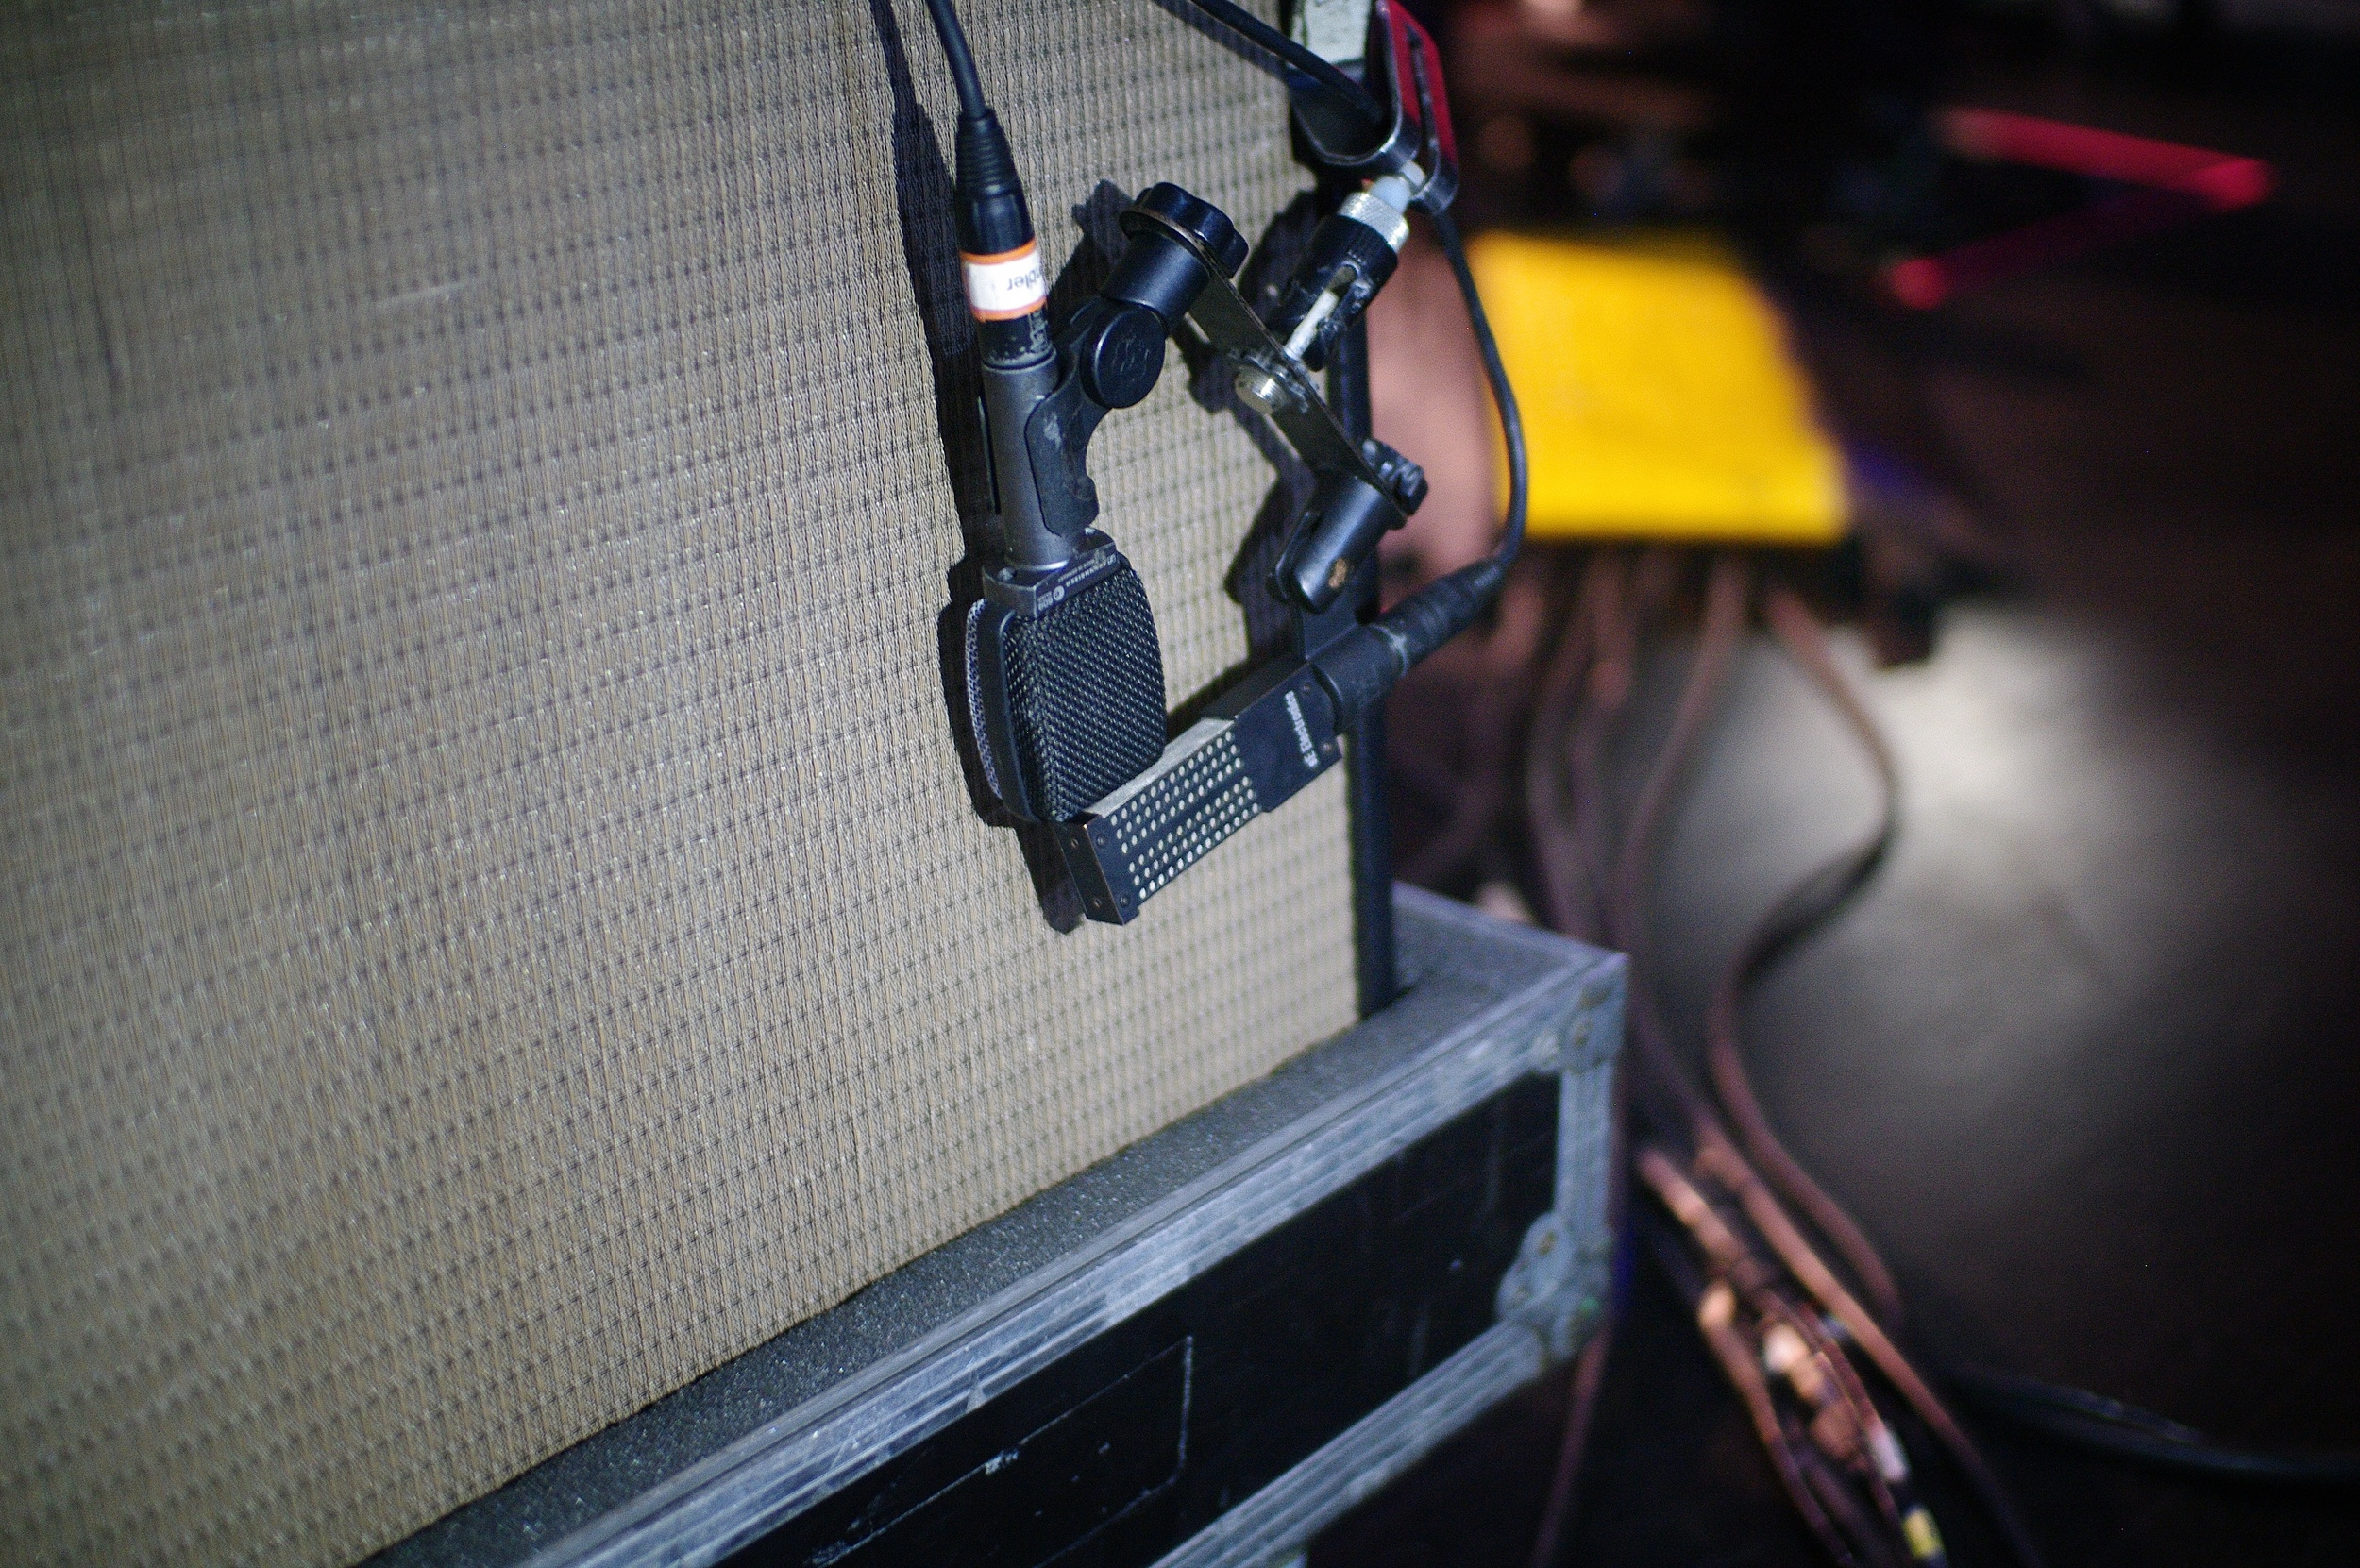 VR1-amp-mmj.jpg